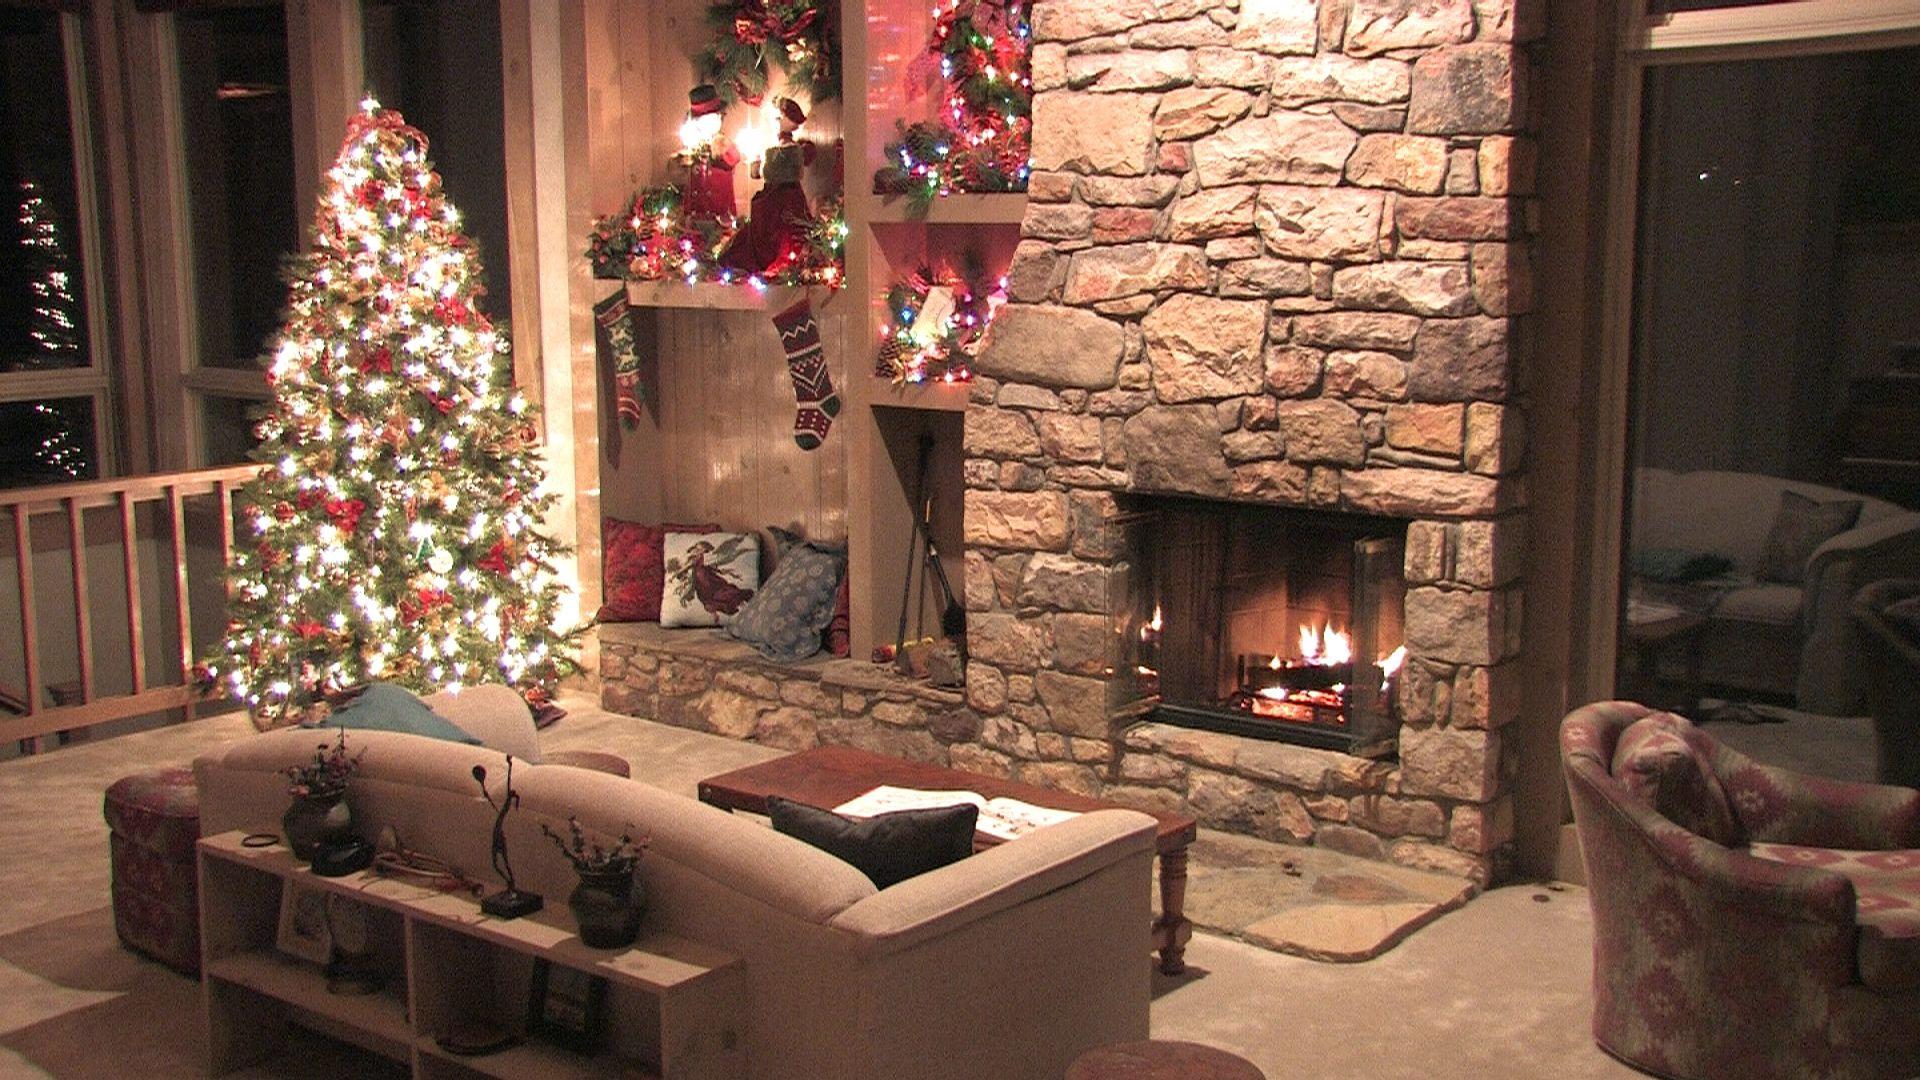 Christmas Fireplace Comfort PC Wallpaper HD